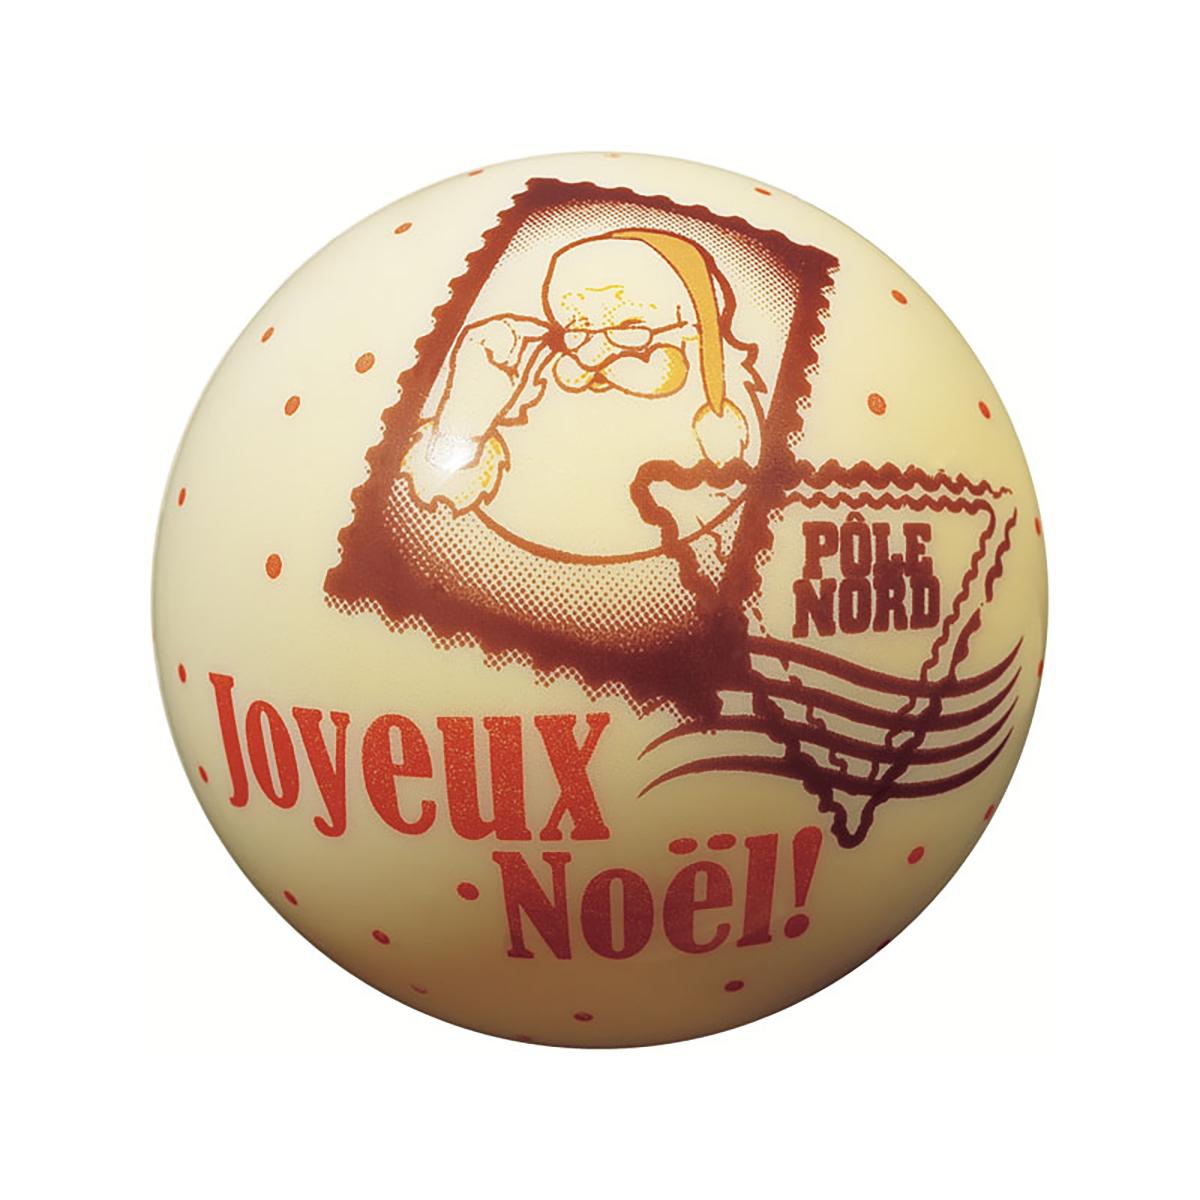 Image De Lettre De Noel.10 Moulds Half Balls Lettre De Noel For 10 Pieces 2 Designs O 5 Cm